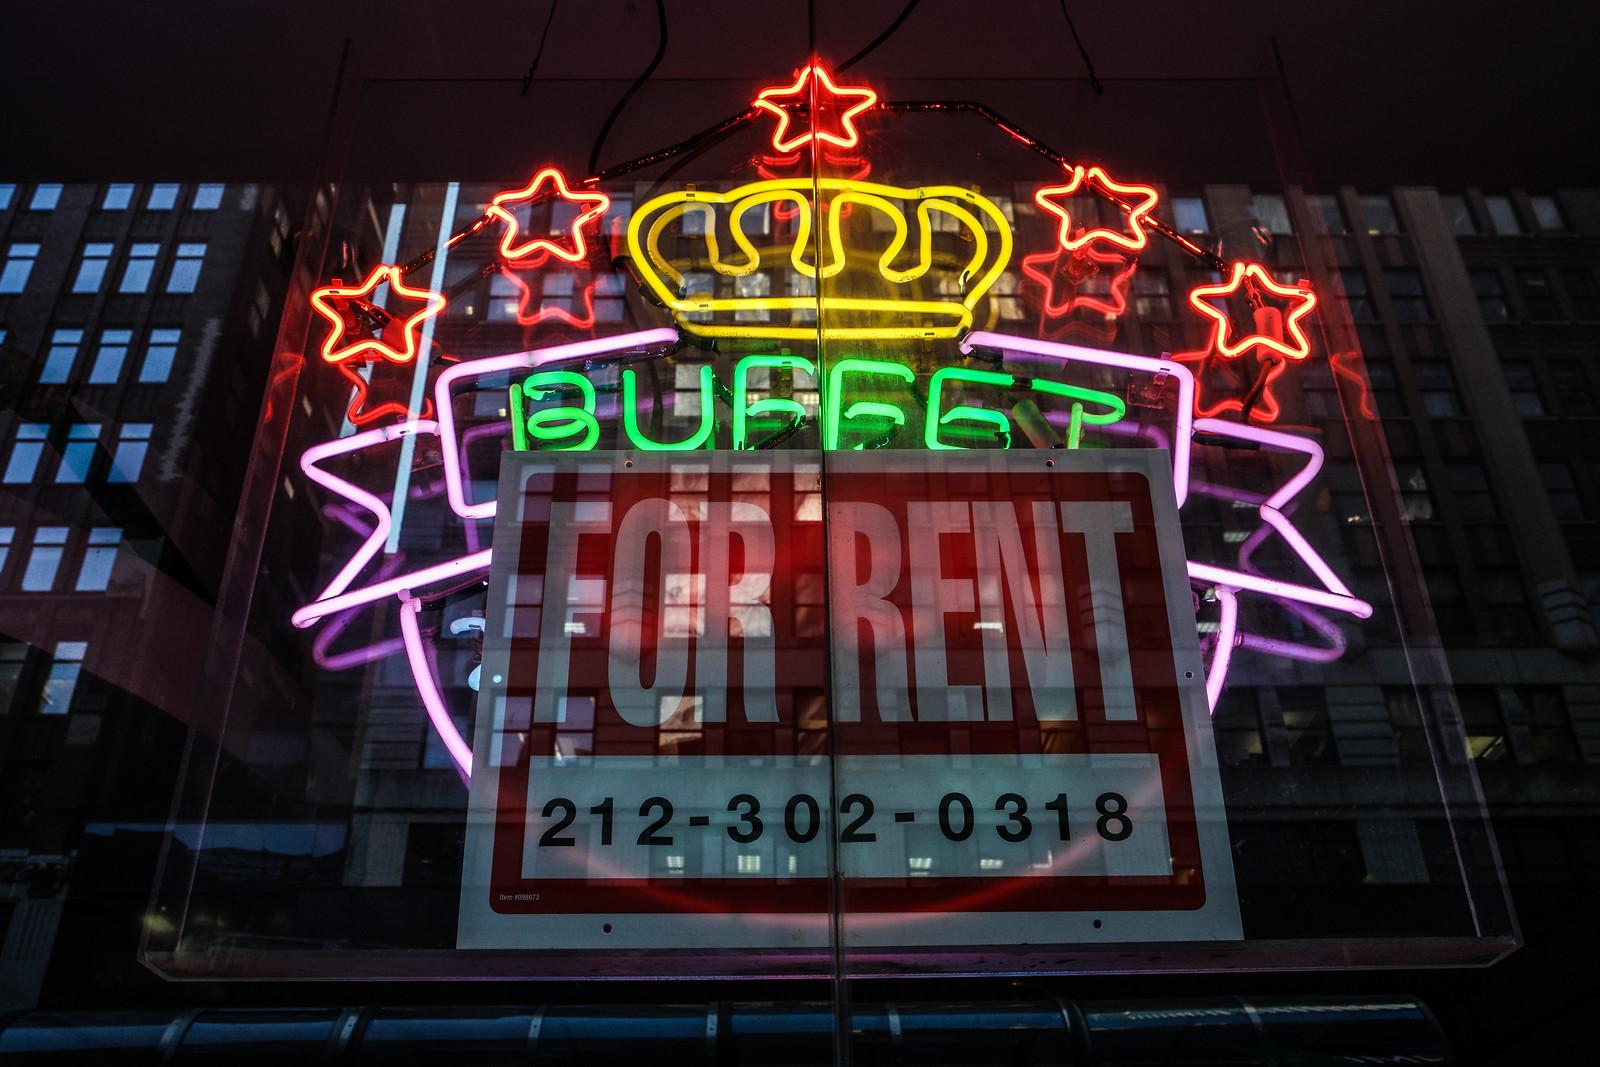 Buffet For Rent